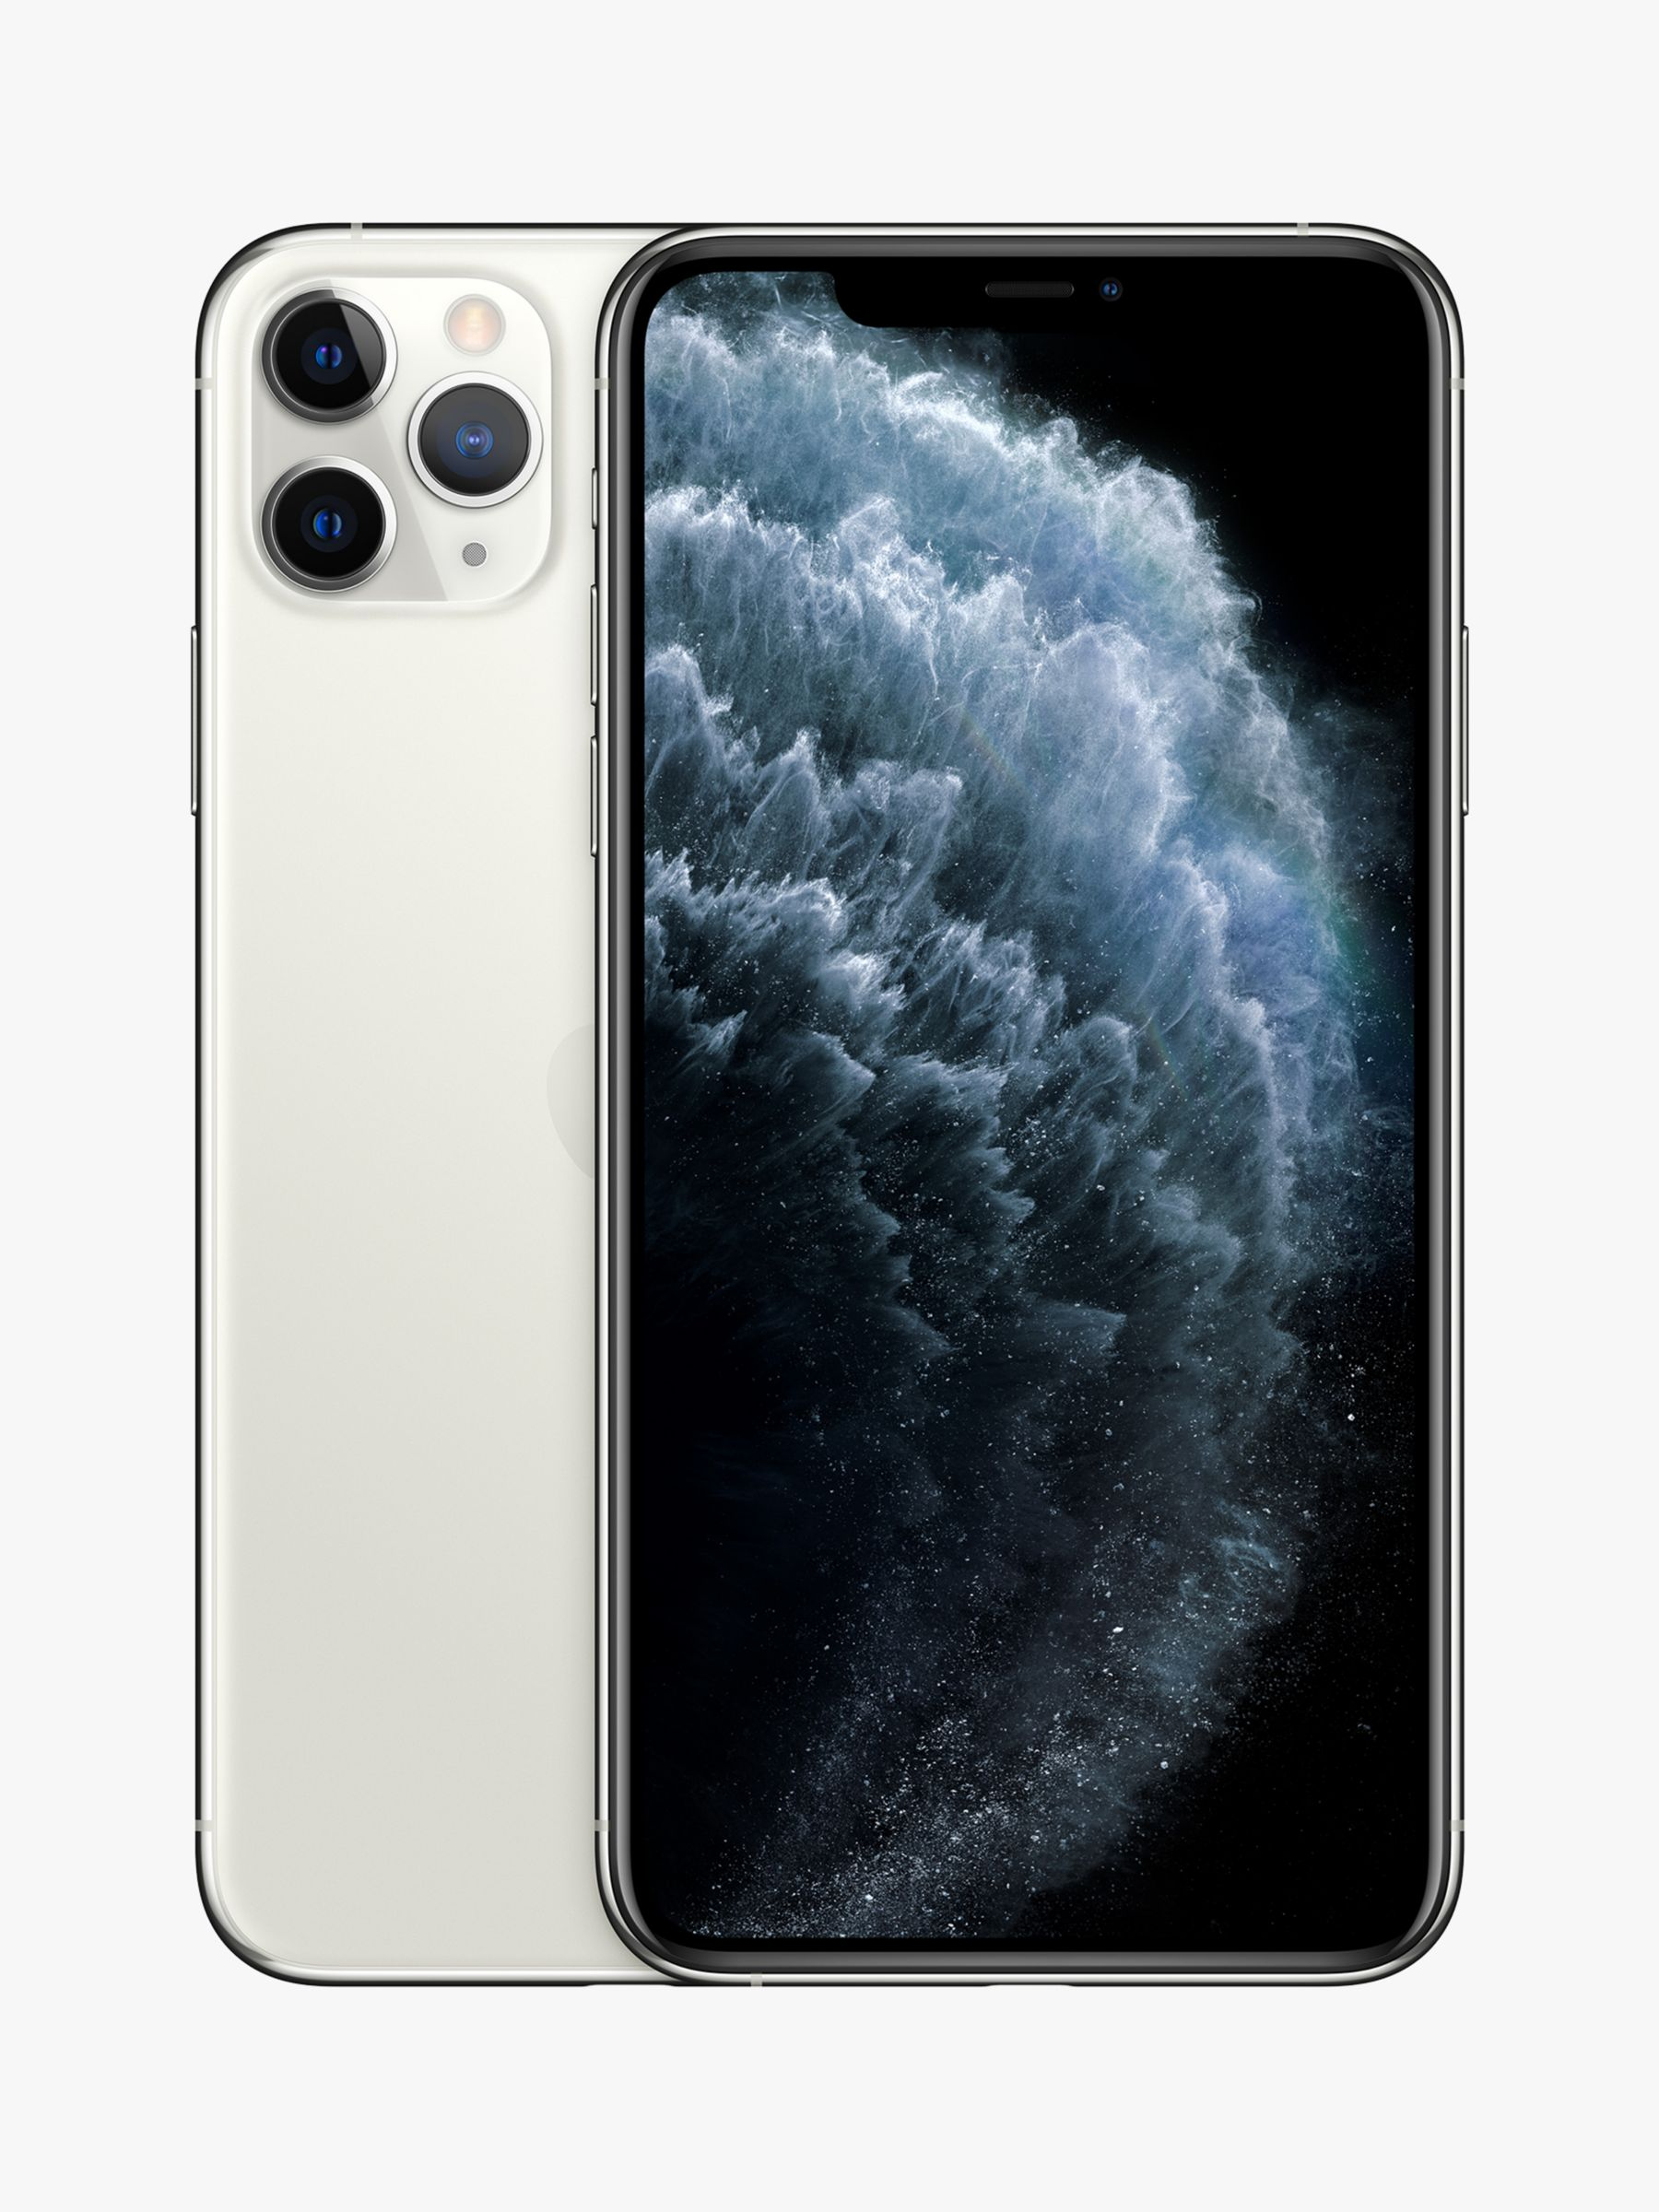 Apple iPhone 11 Pro Max, iOS, 6.5